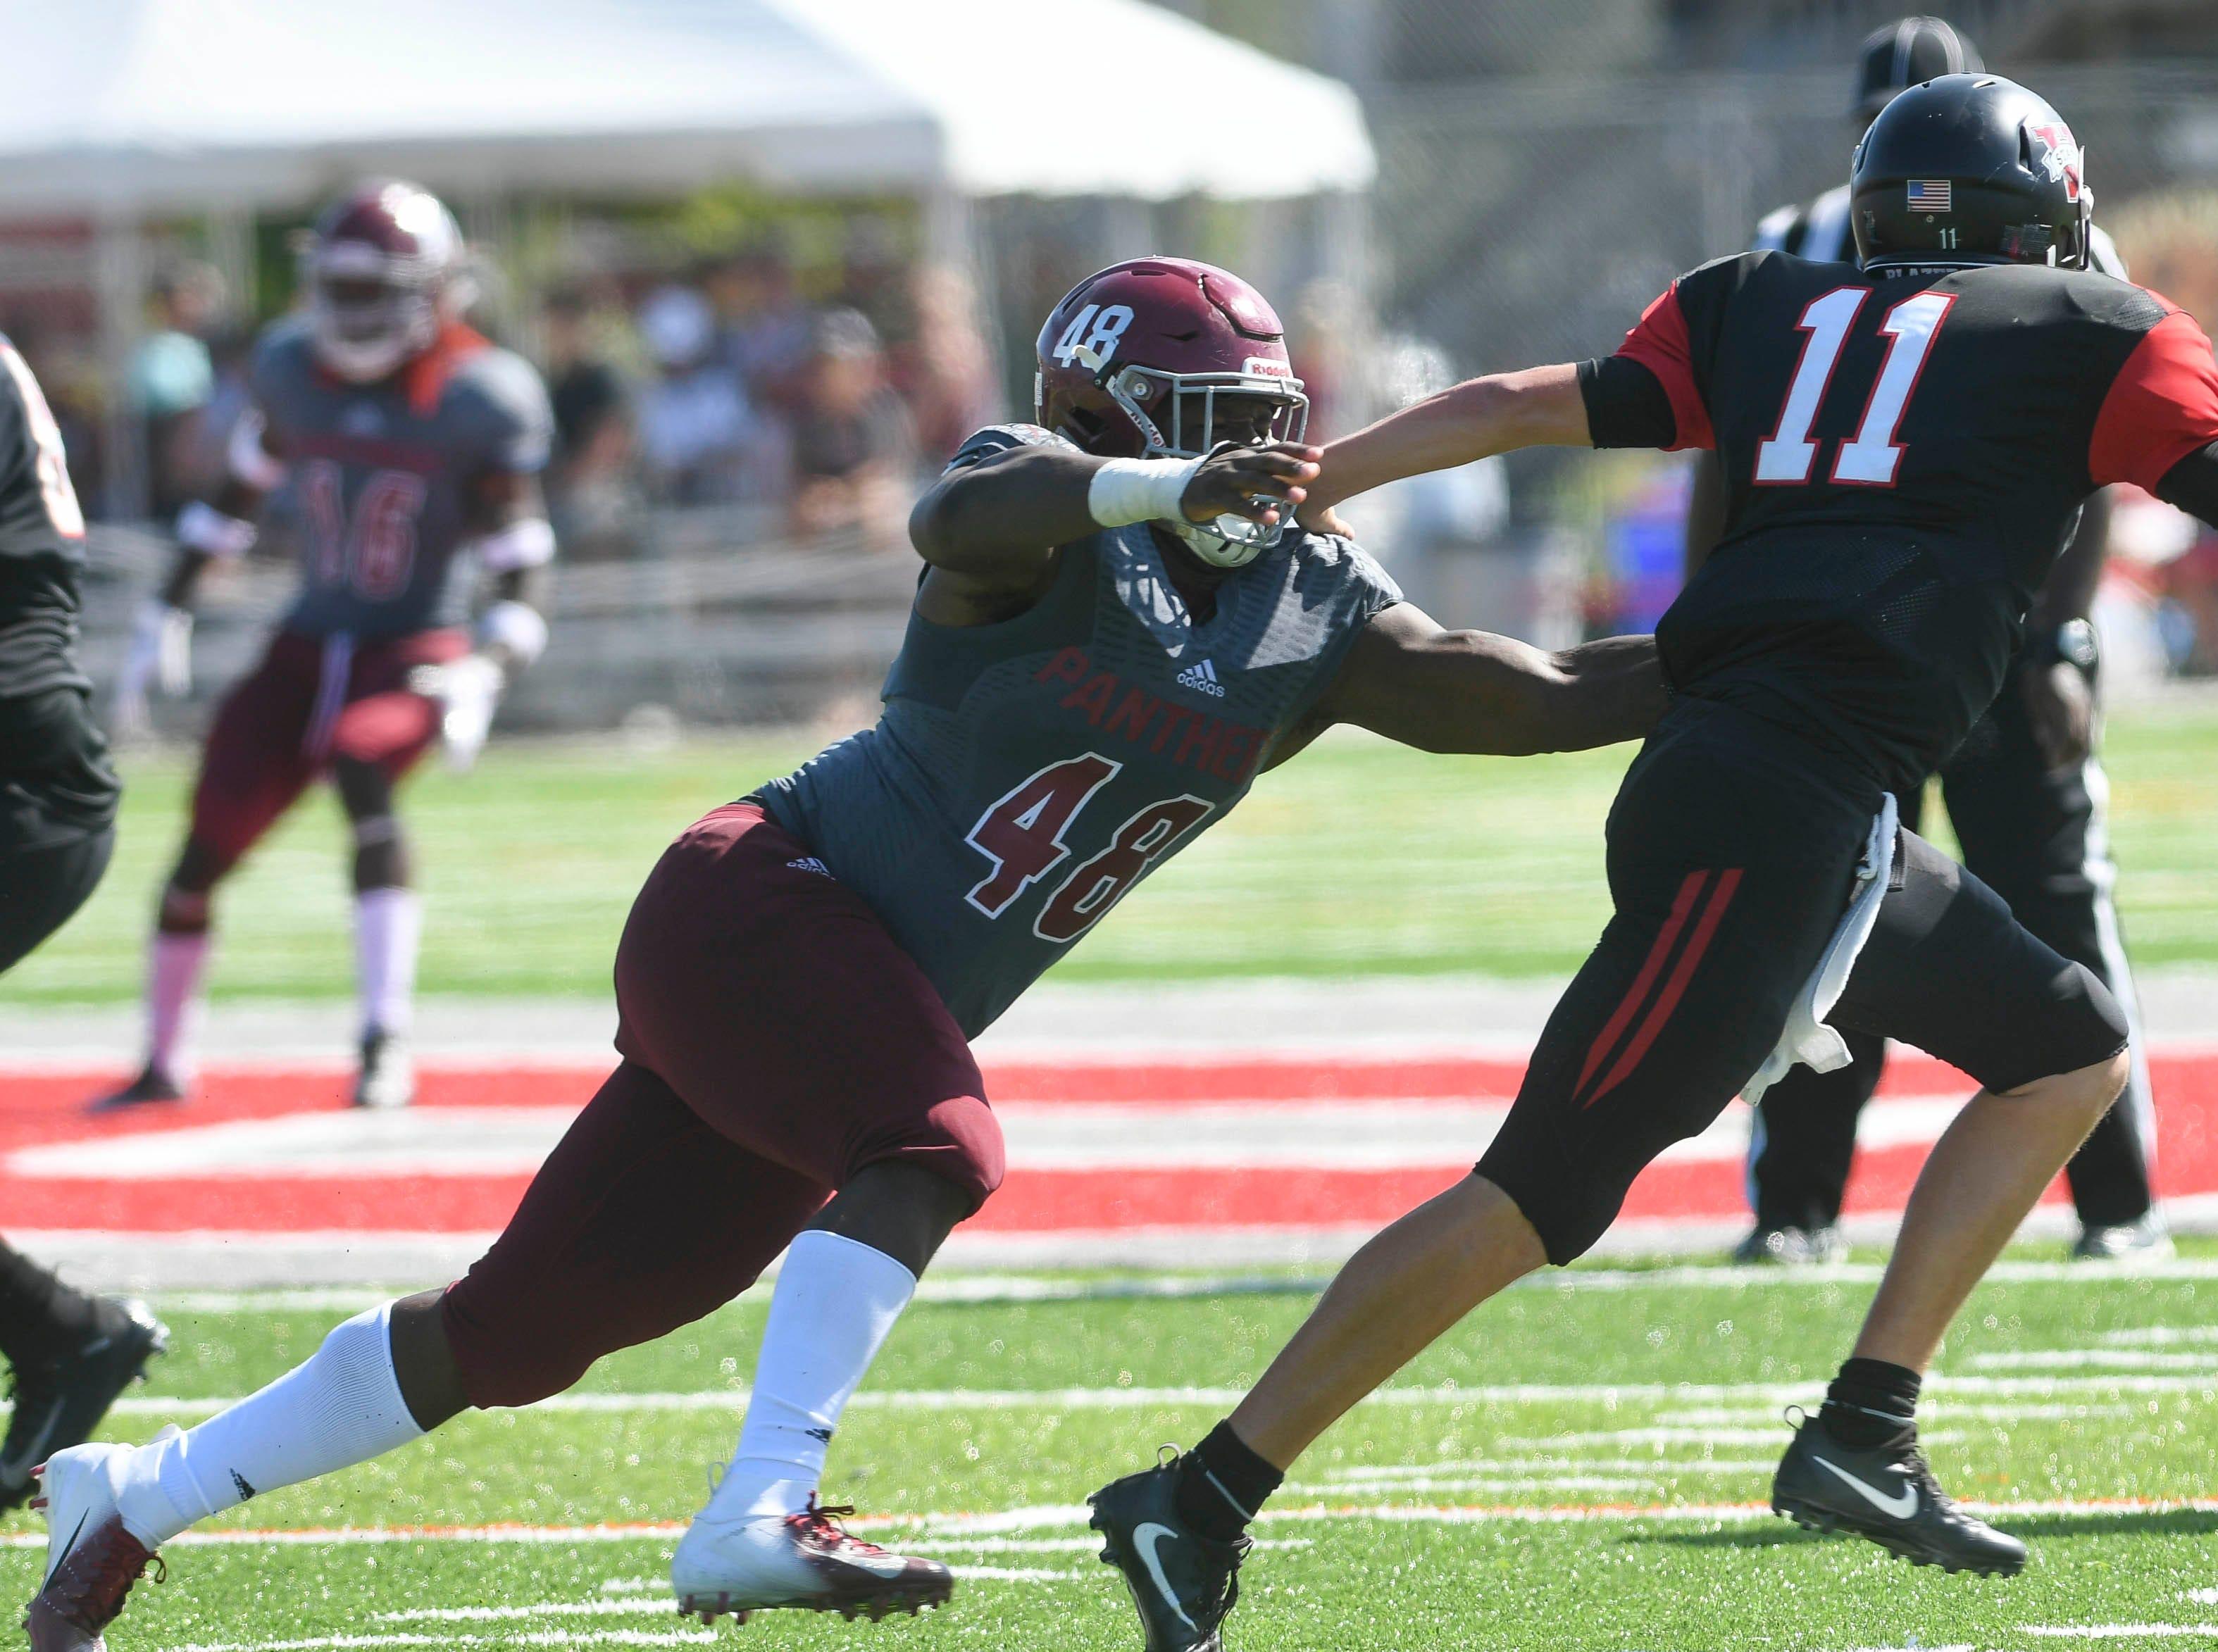 Adonis Davis of Florida Tech pursues Valdosta St. QB Rogan Wells during Saturday's game.